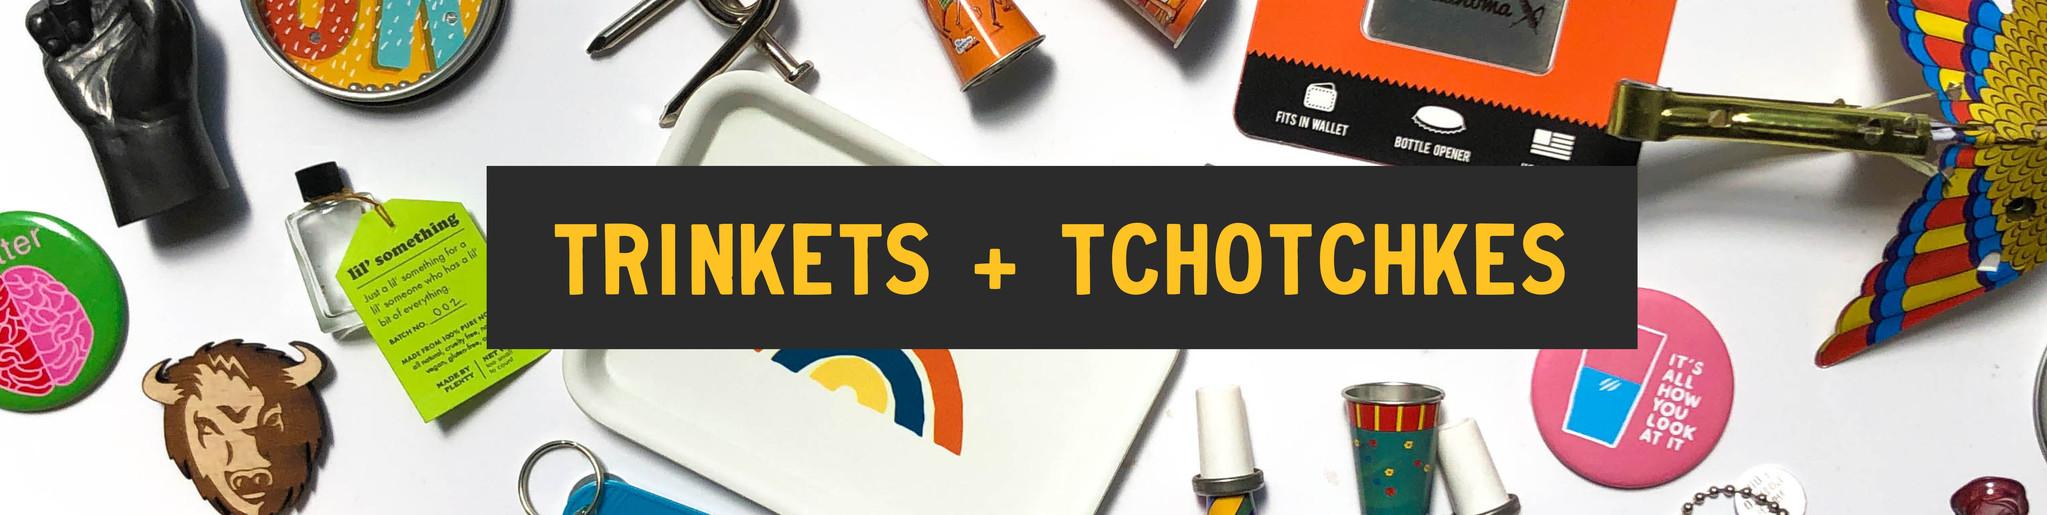 Trinkets + Tchotchkes